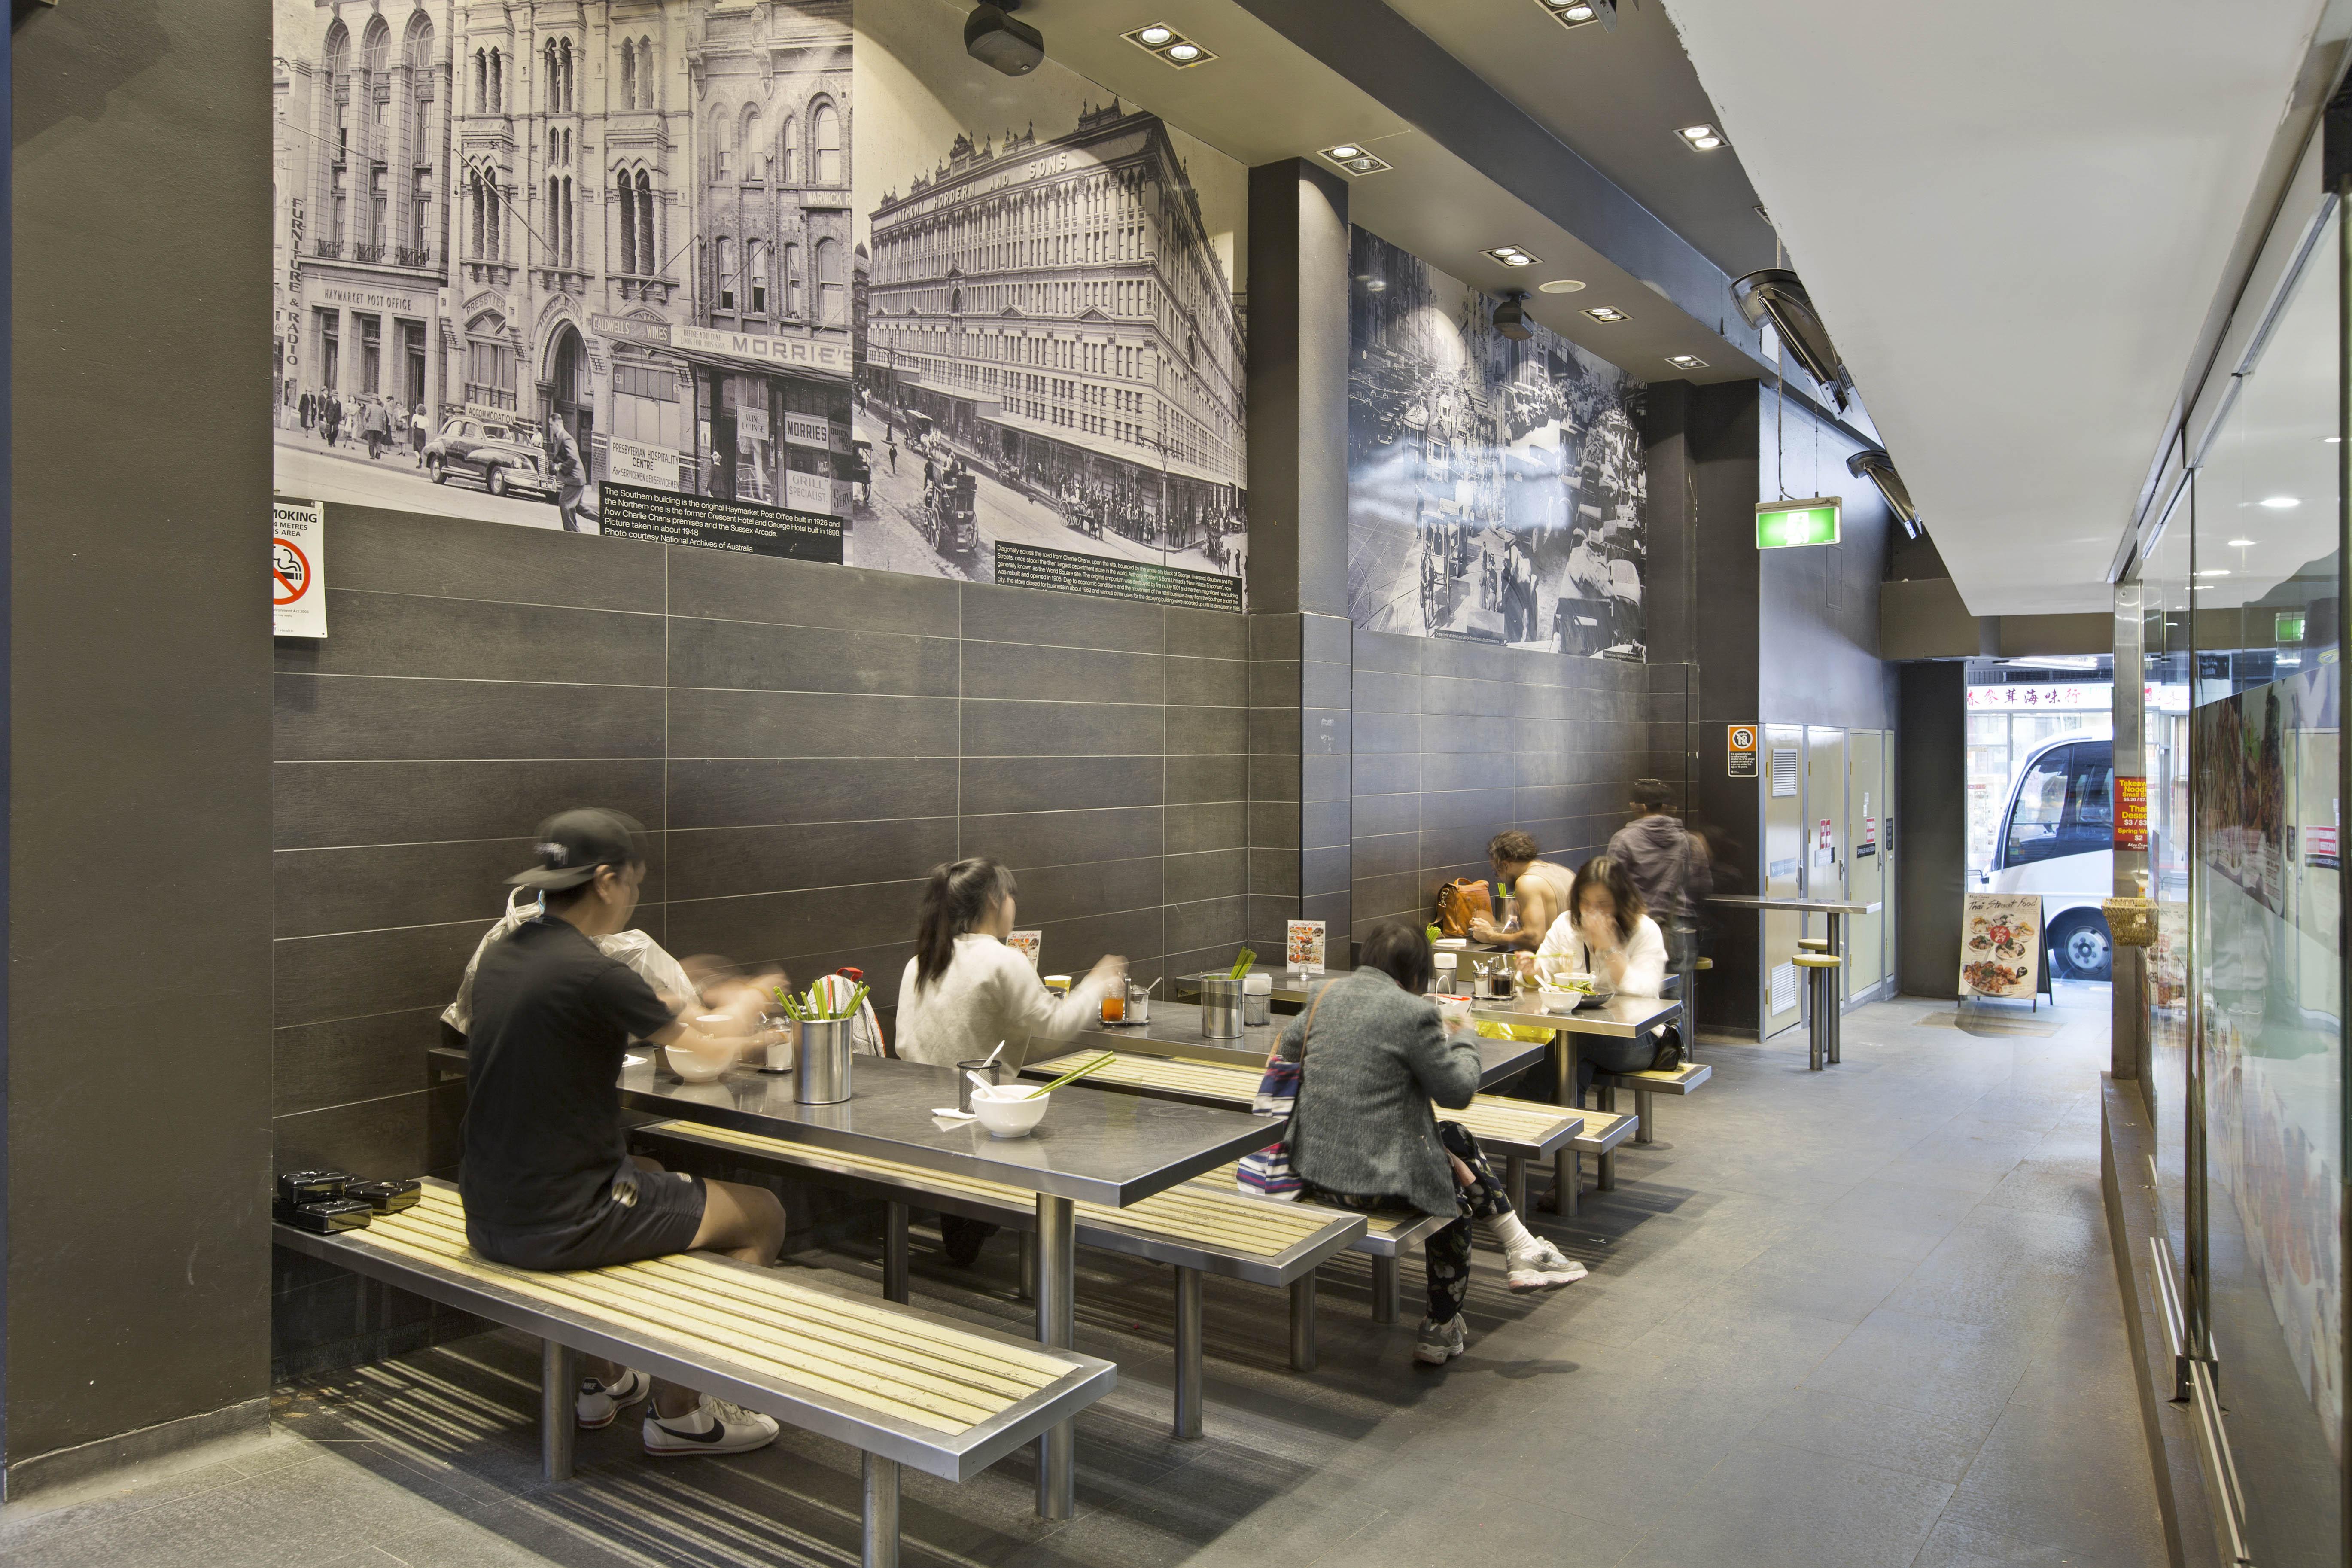 Mrs Chans Kitchen | Food | Charlie Chans